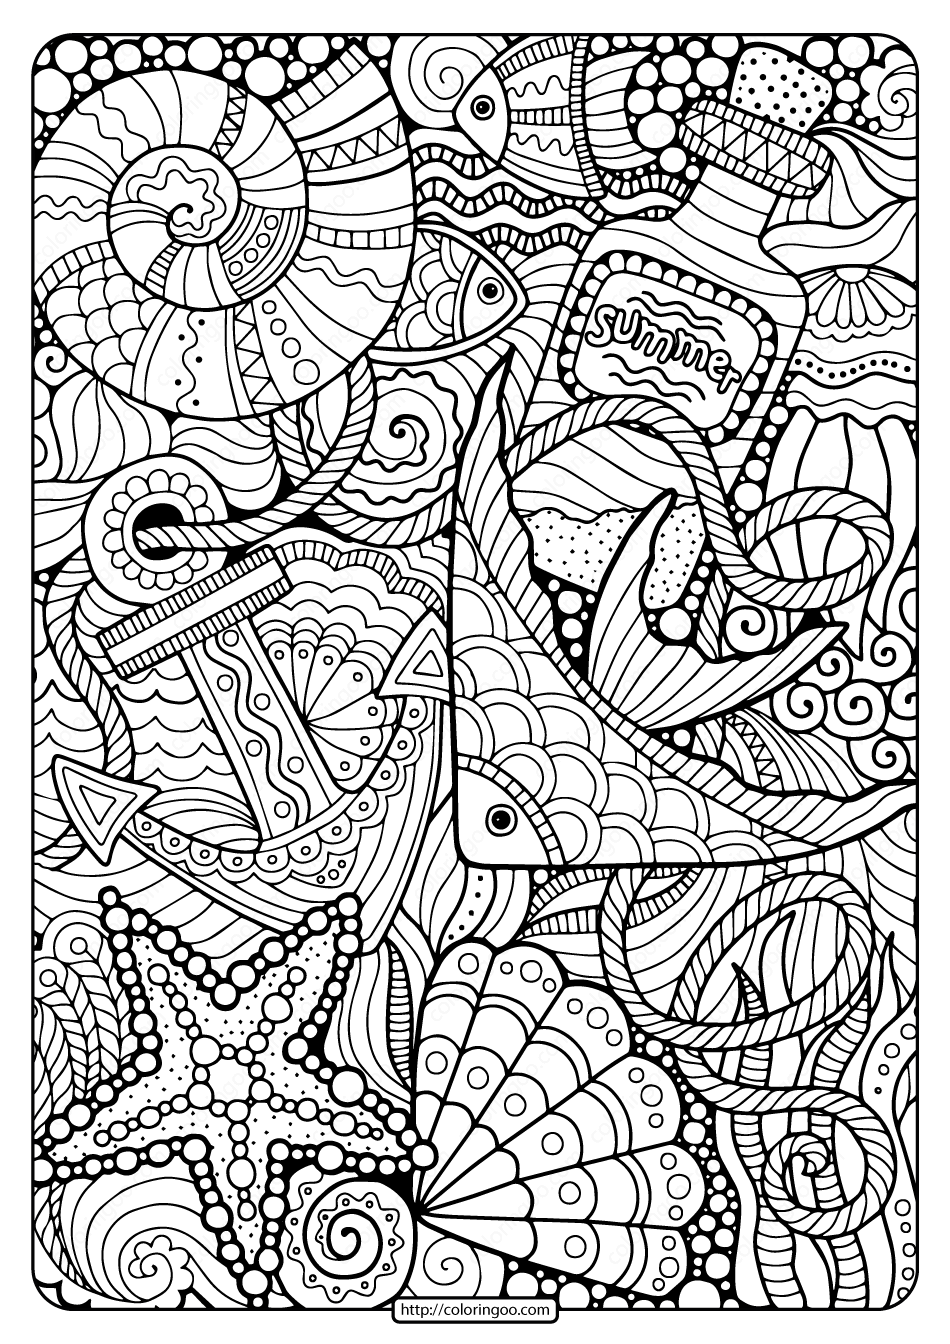 Printable Summer Sea Pdf Coloring Page Summer Coloring Pages Cool Coloring Pages Coloring Books